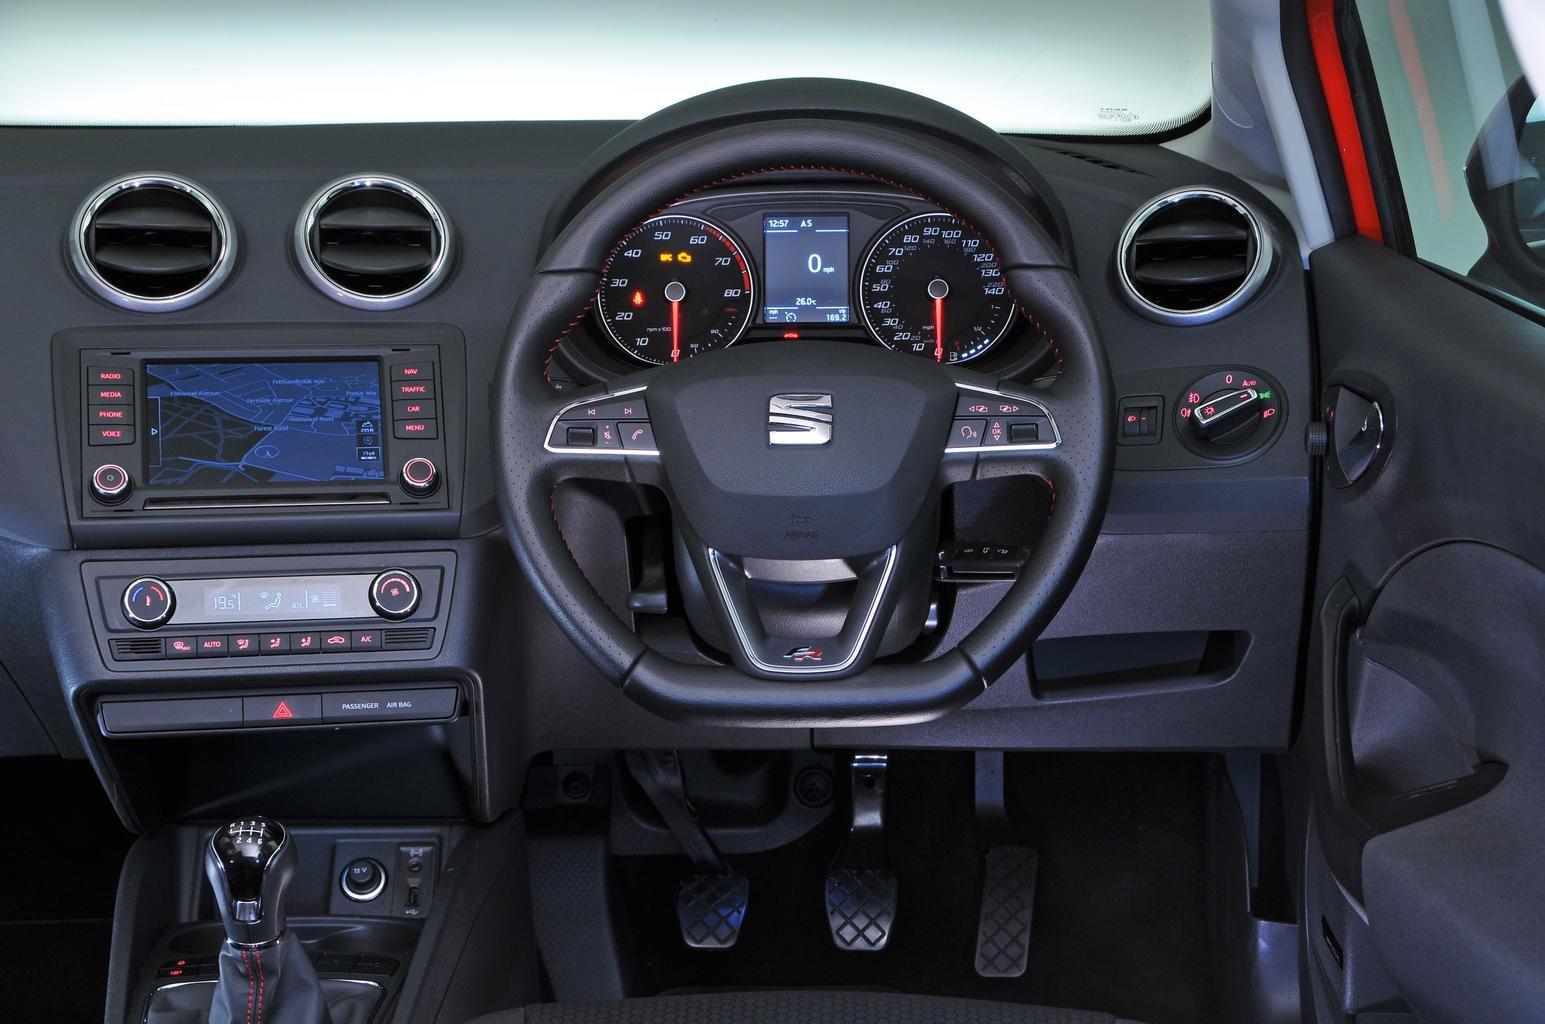 Ford Fiesta ST-Line vs Seat Ibiza FR vs Skoda Fabia Monte Carlo